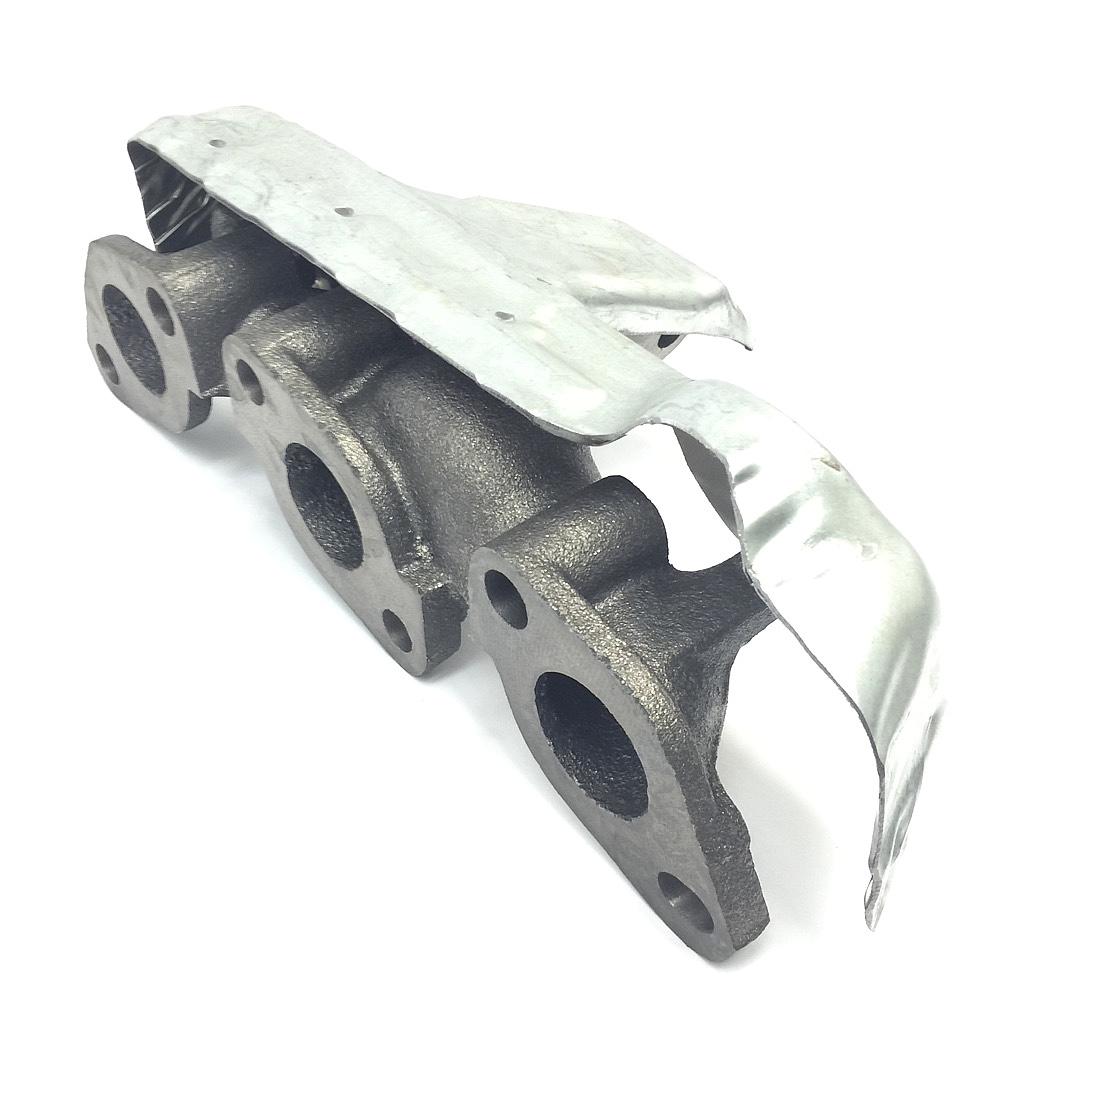 3.3 fits frontier xterra exhaust manifold 1999 2000 2001 ... 2003 nissan xterra manifold diagram